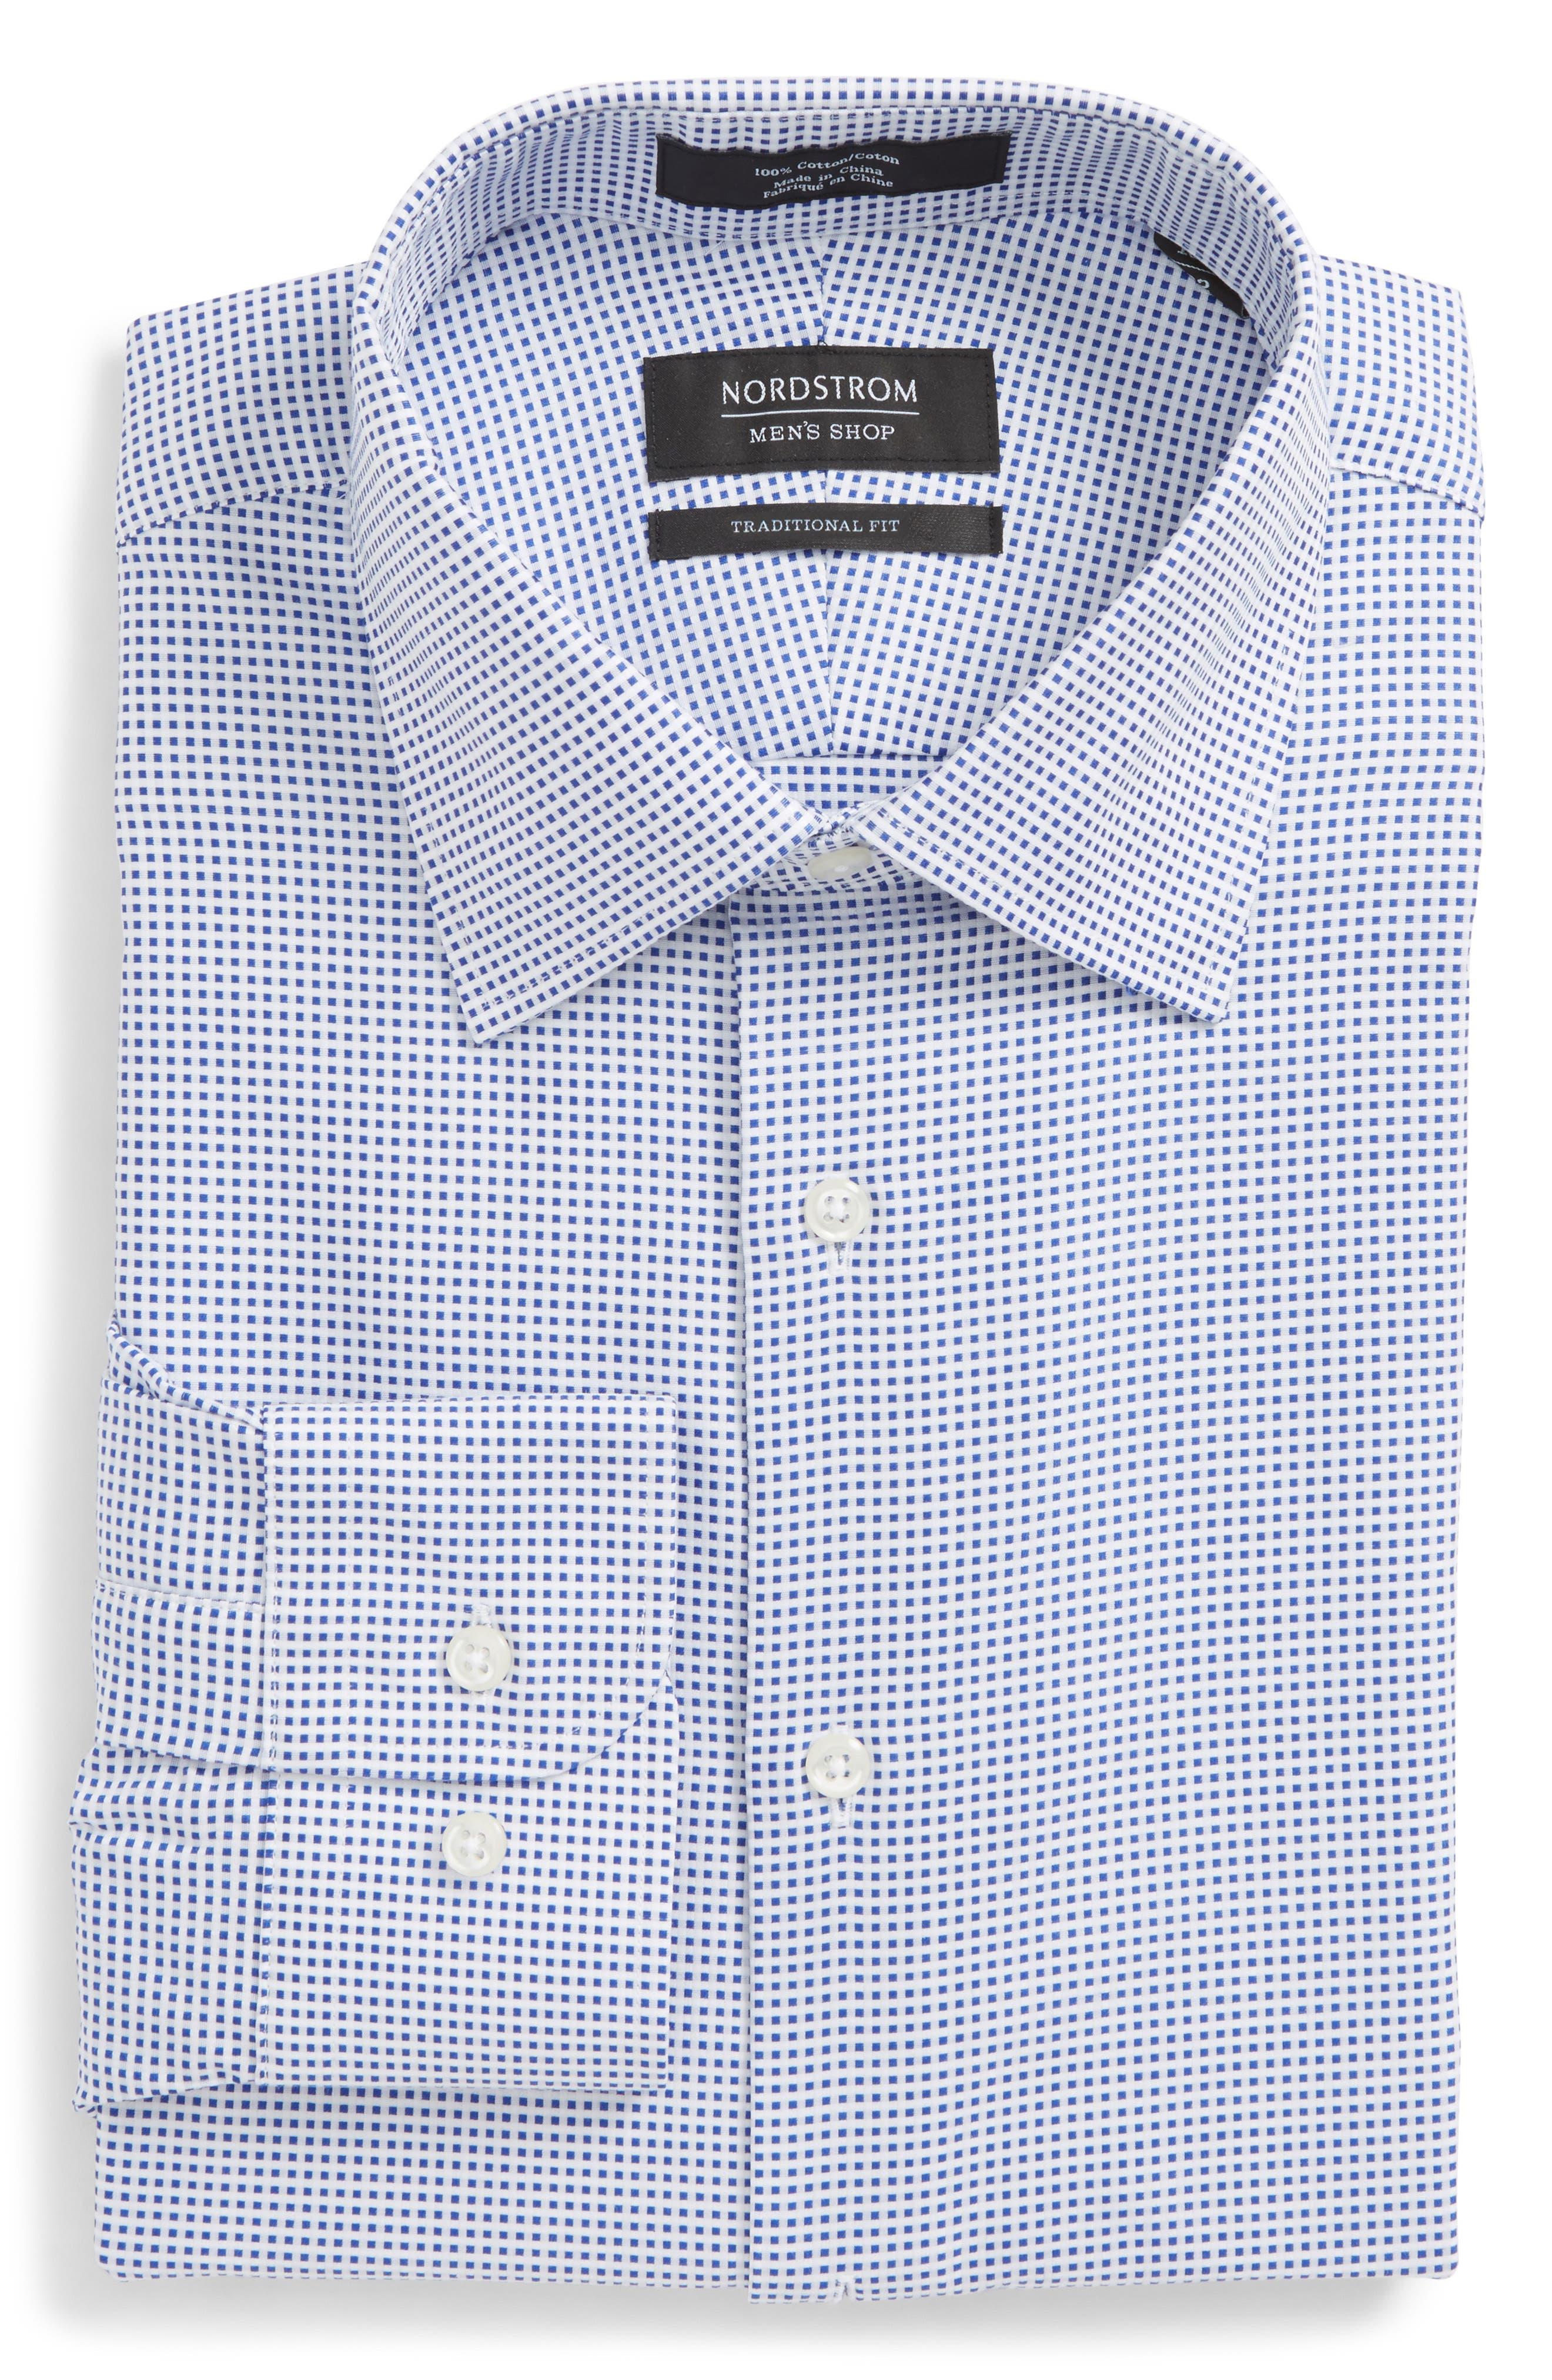 Nordstrom Men's Shop Traditional Fit Microcheck Dress Shirt